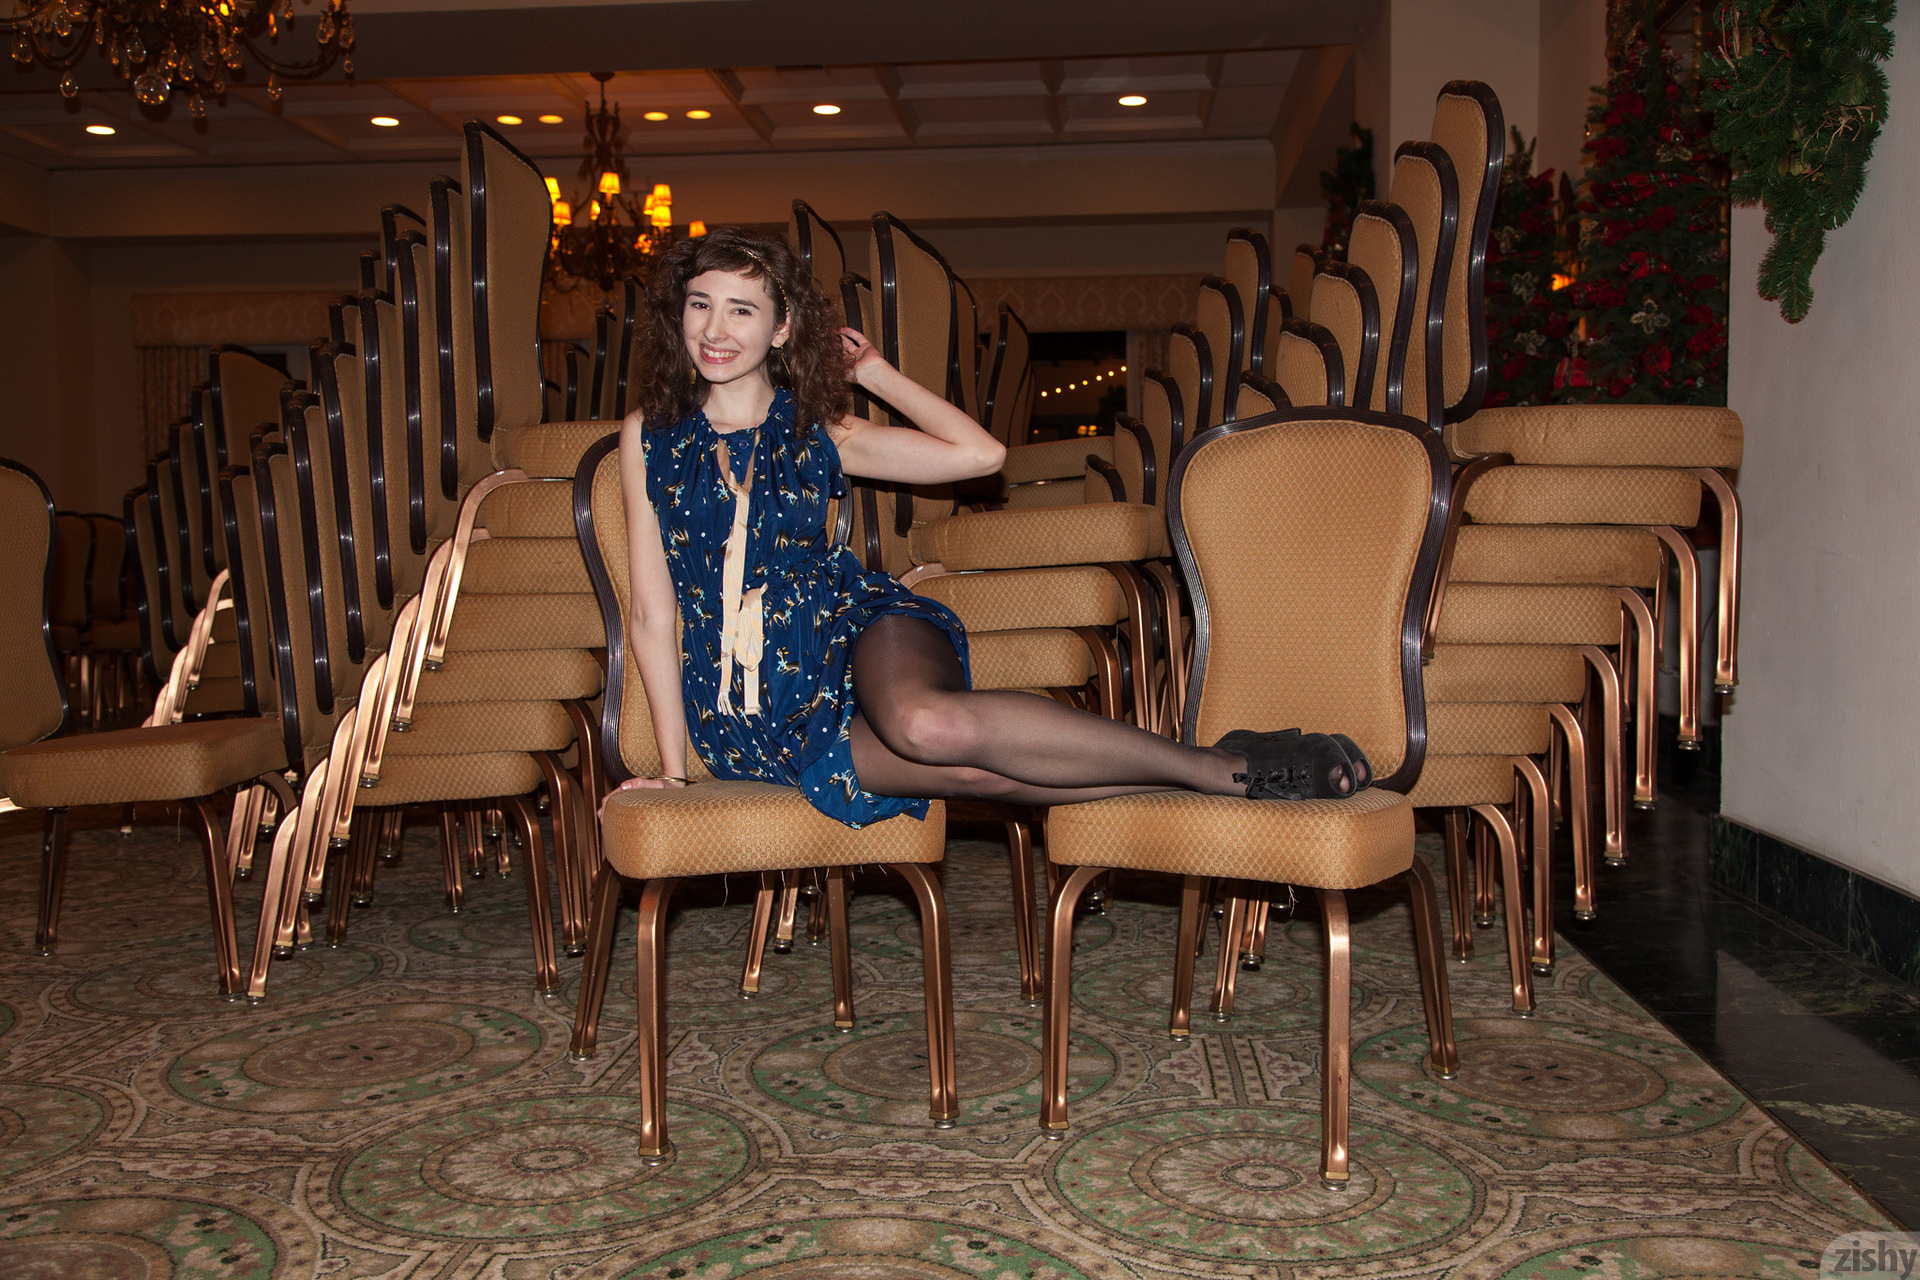 Yvette Nolot At Arizona Inn Zishy (26)